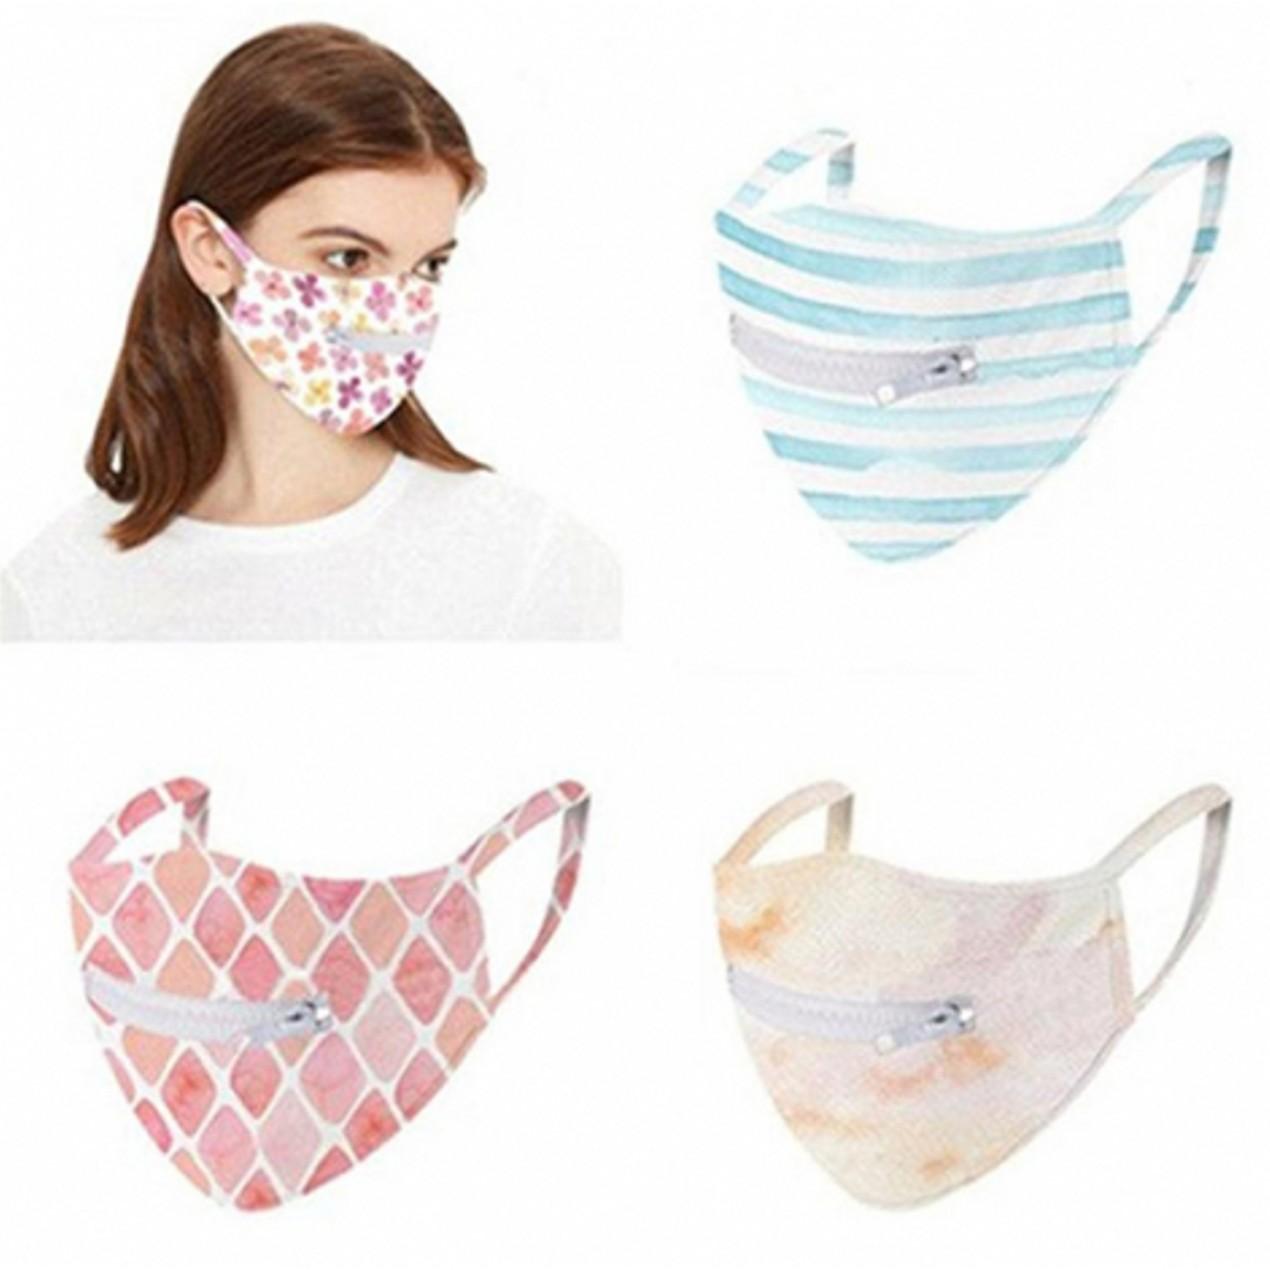 5-Pack Washable Zipper Mask